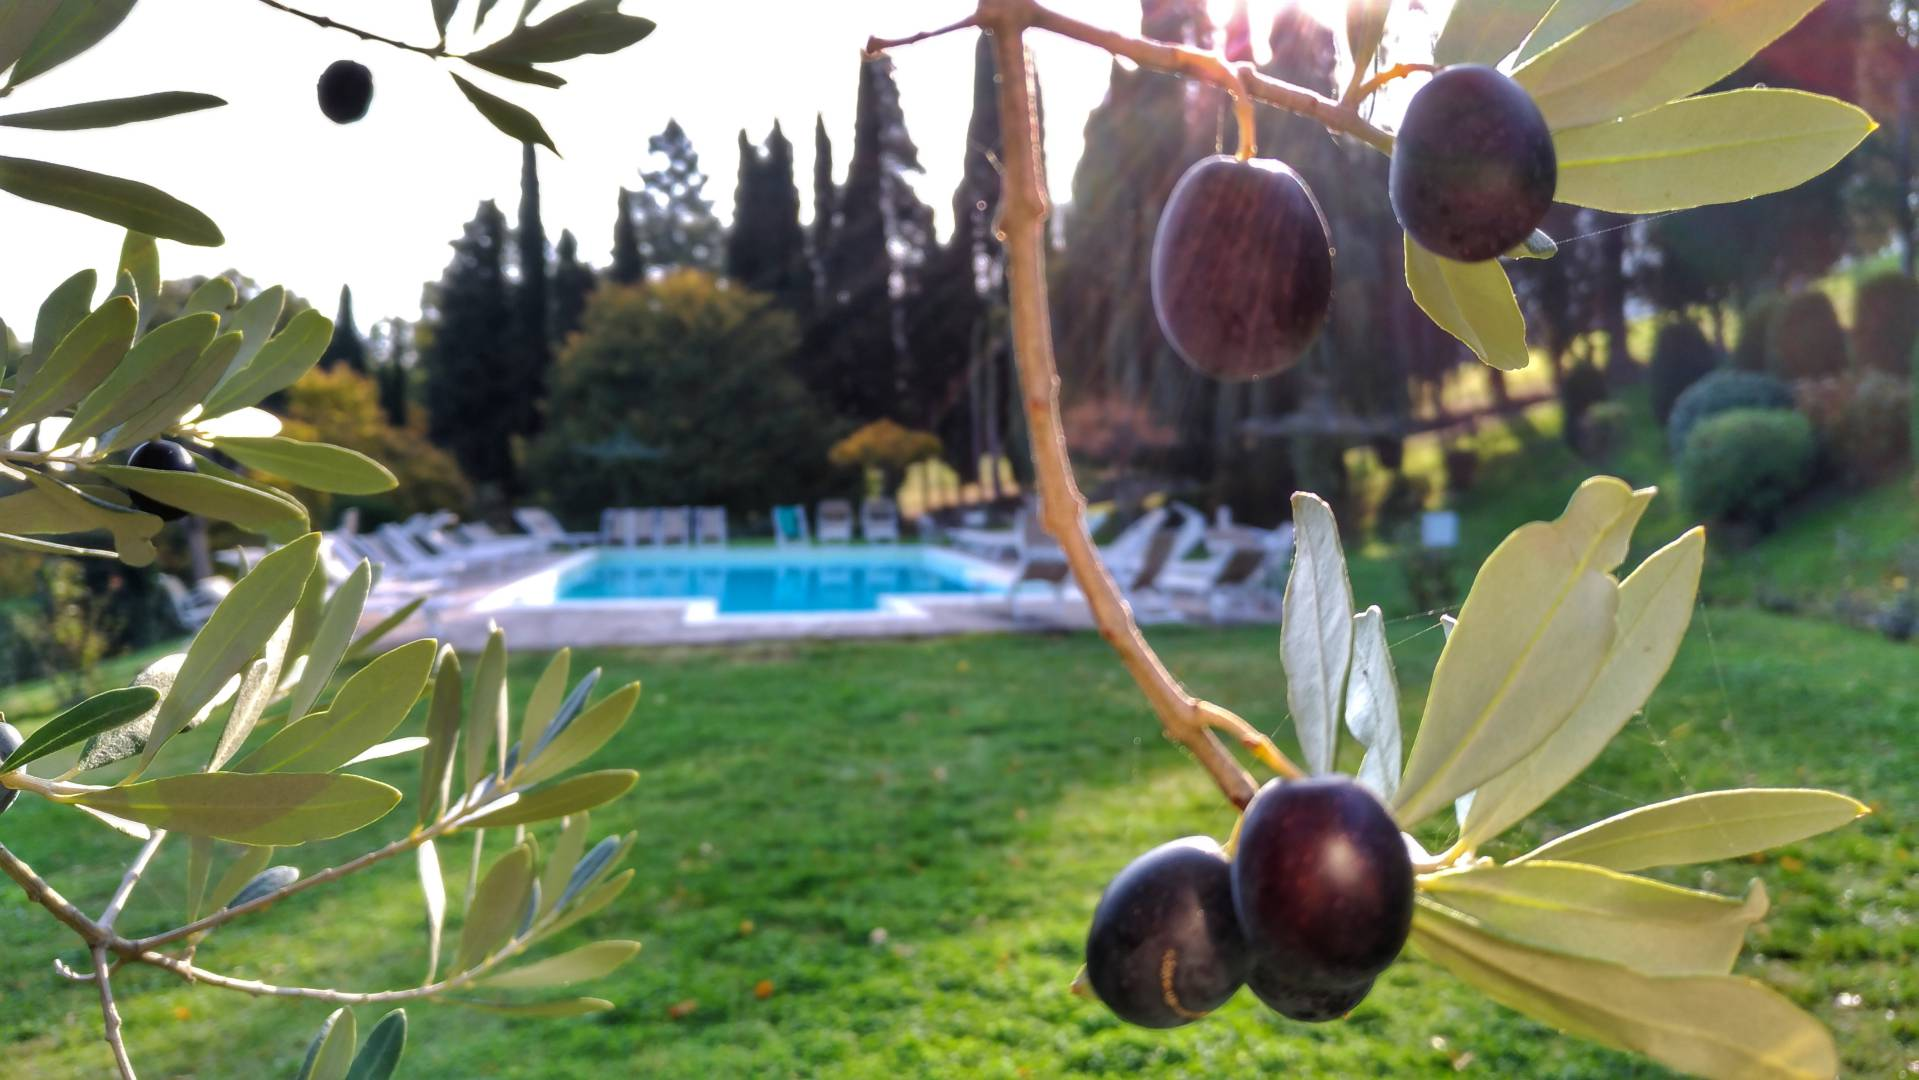 La vacanza in Toscana a Villa Campestri Olive Oil Resort